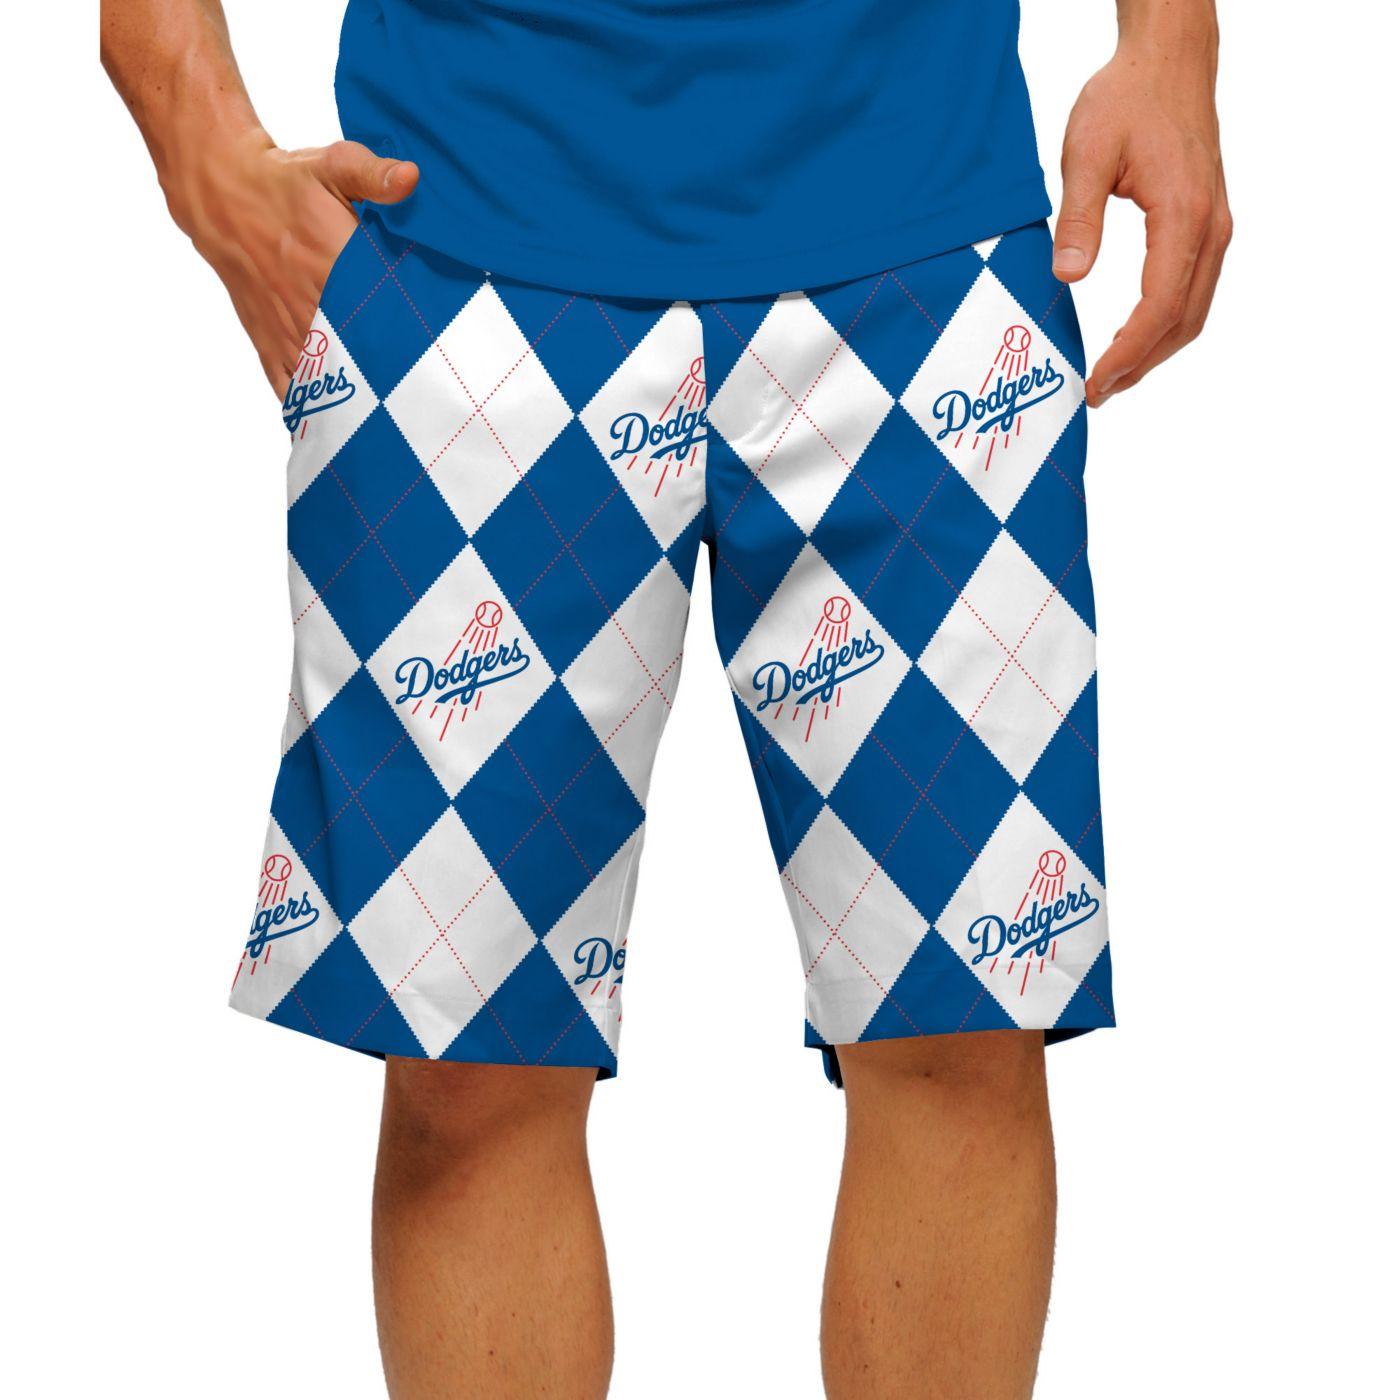 Loudmouth Men's Los Angeles Dodgers Golf Shorts